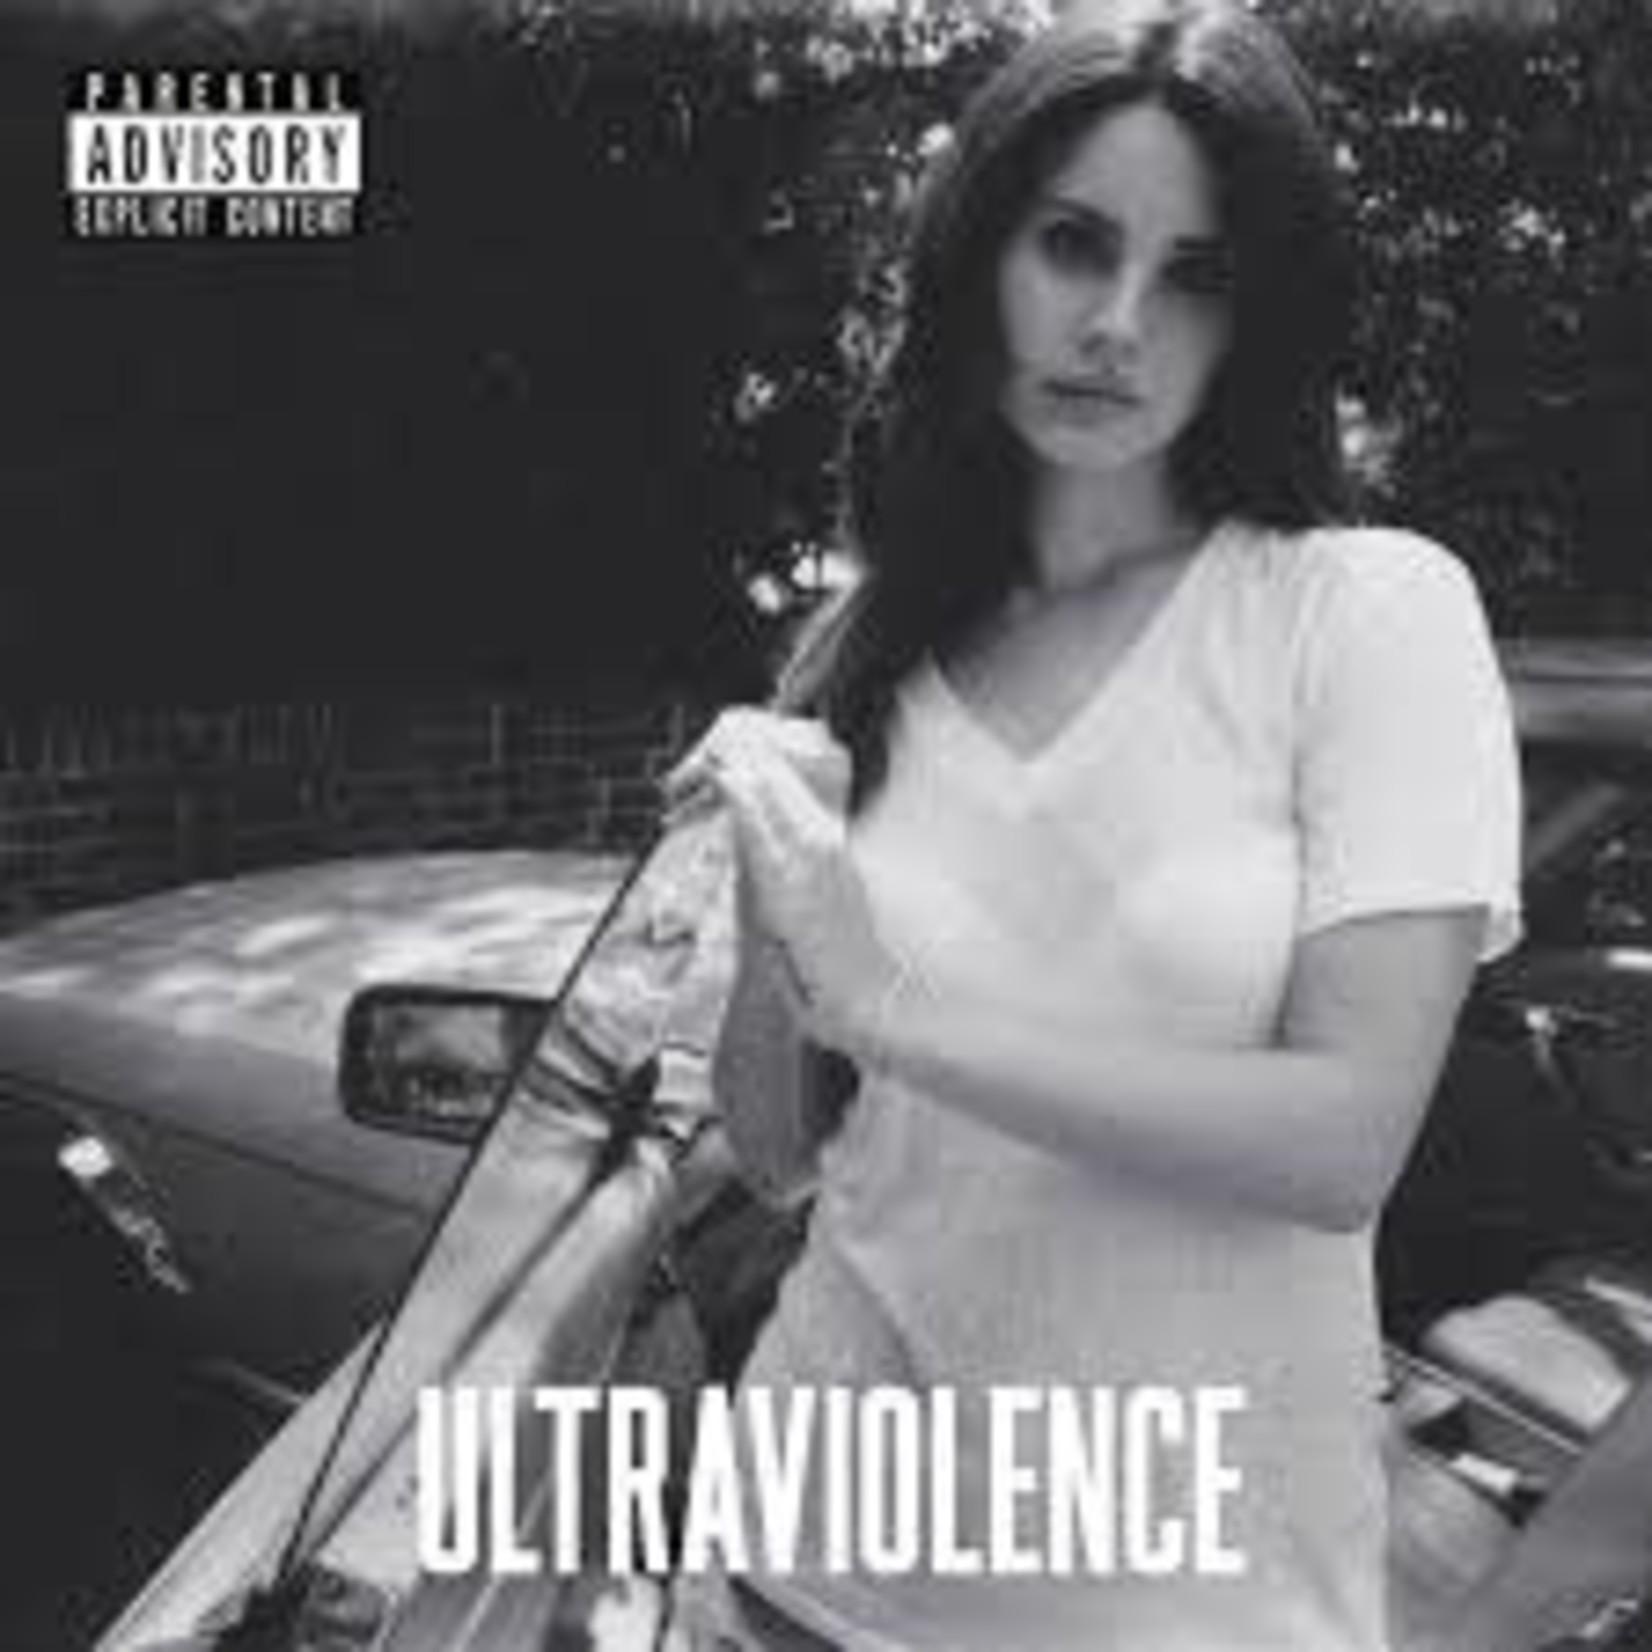 Vinyl Lana Del Ray - Ultraviolence